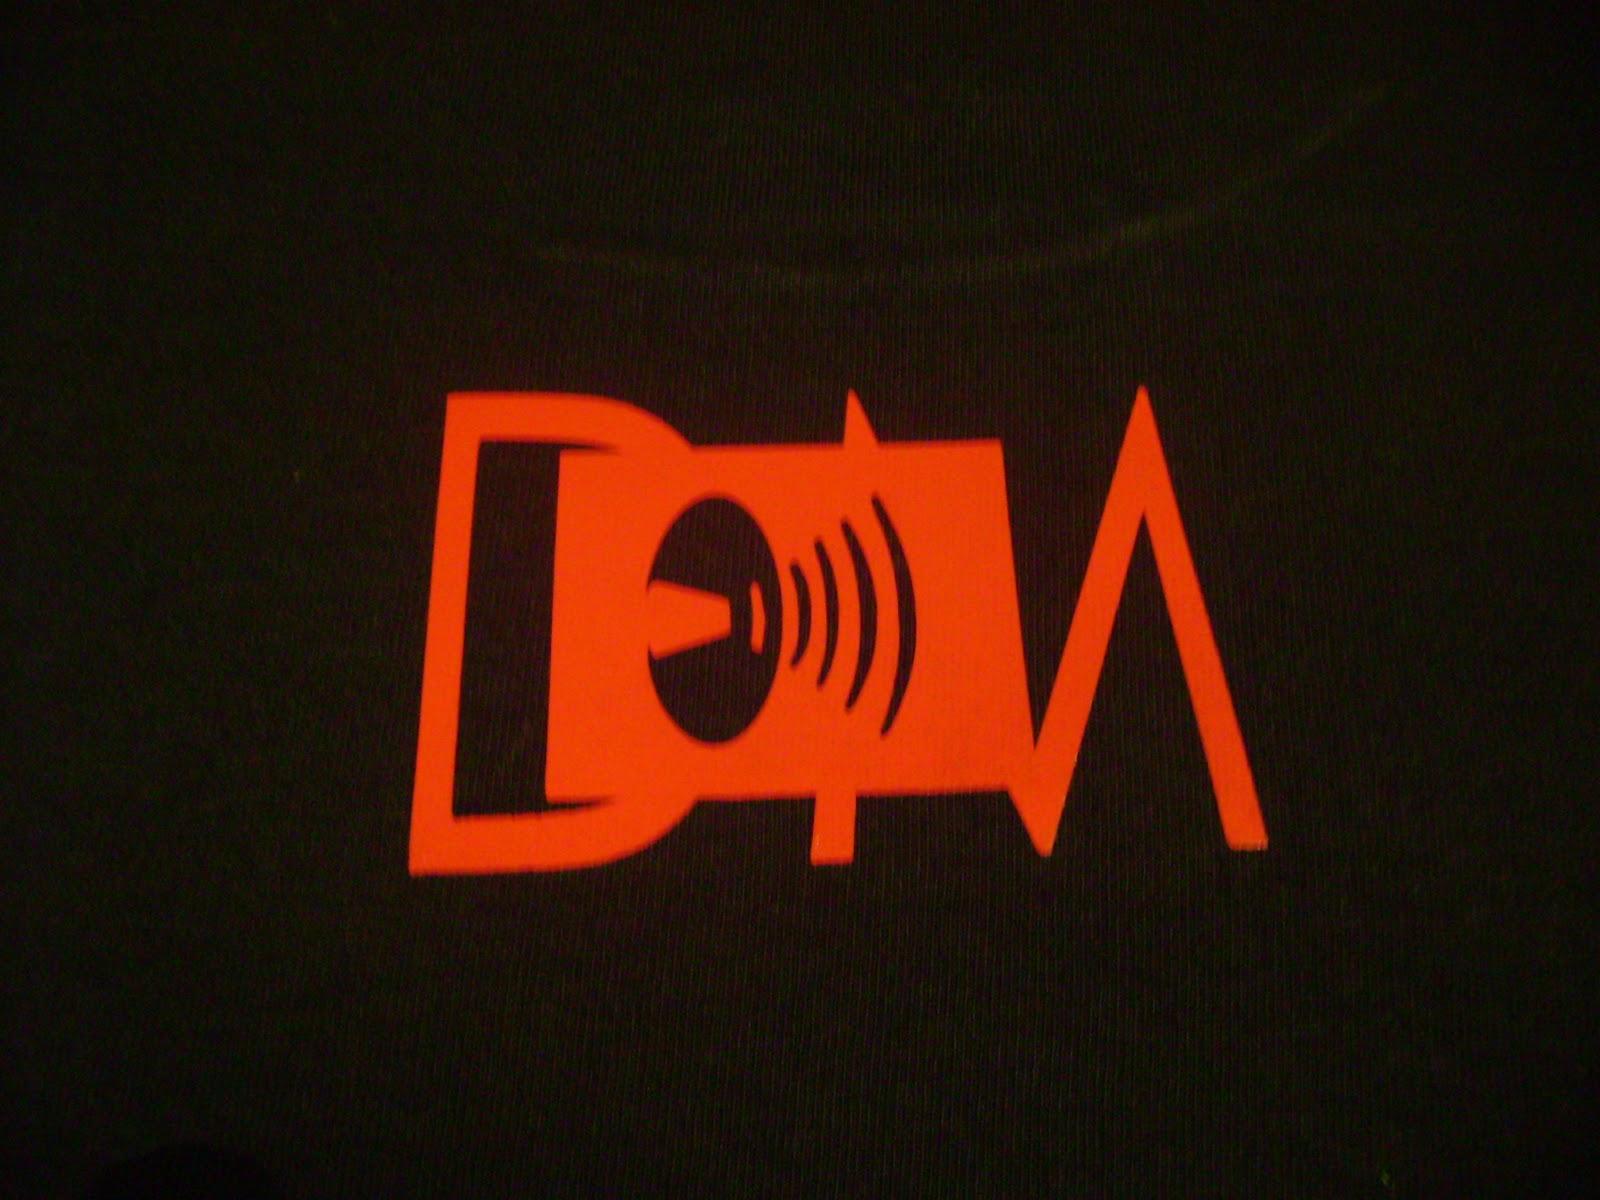 depeche mode logo car interior design